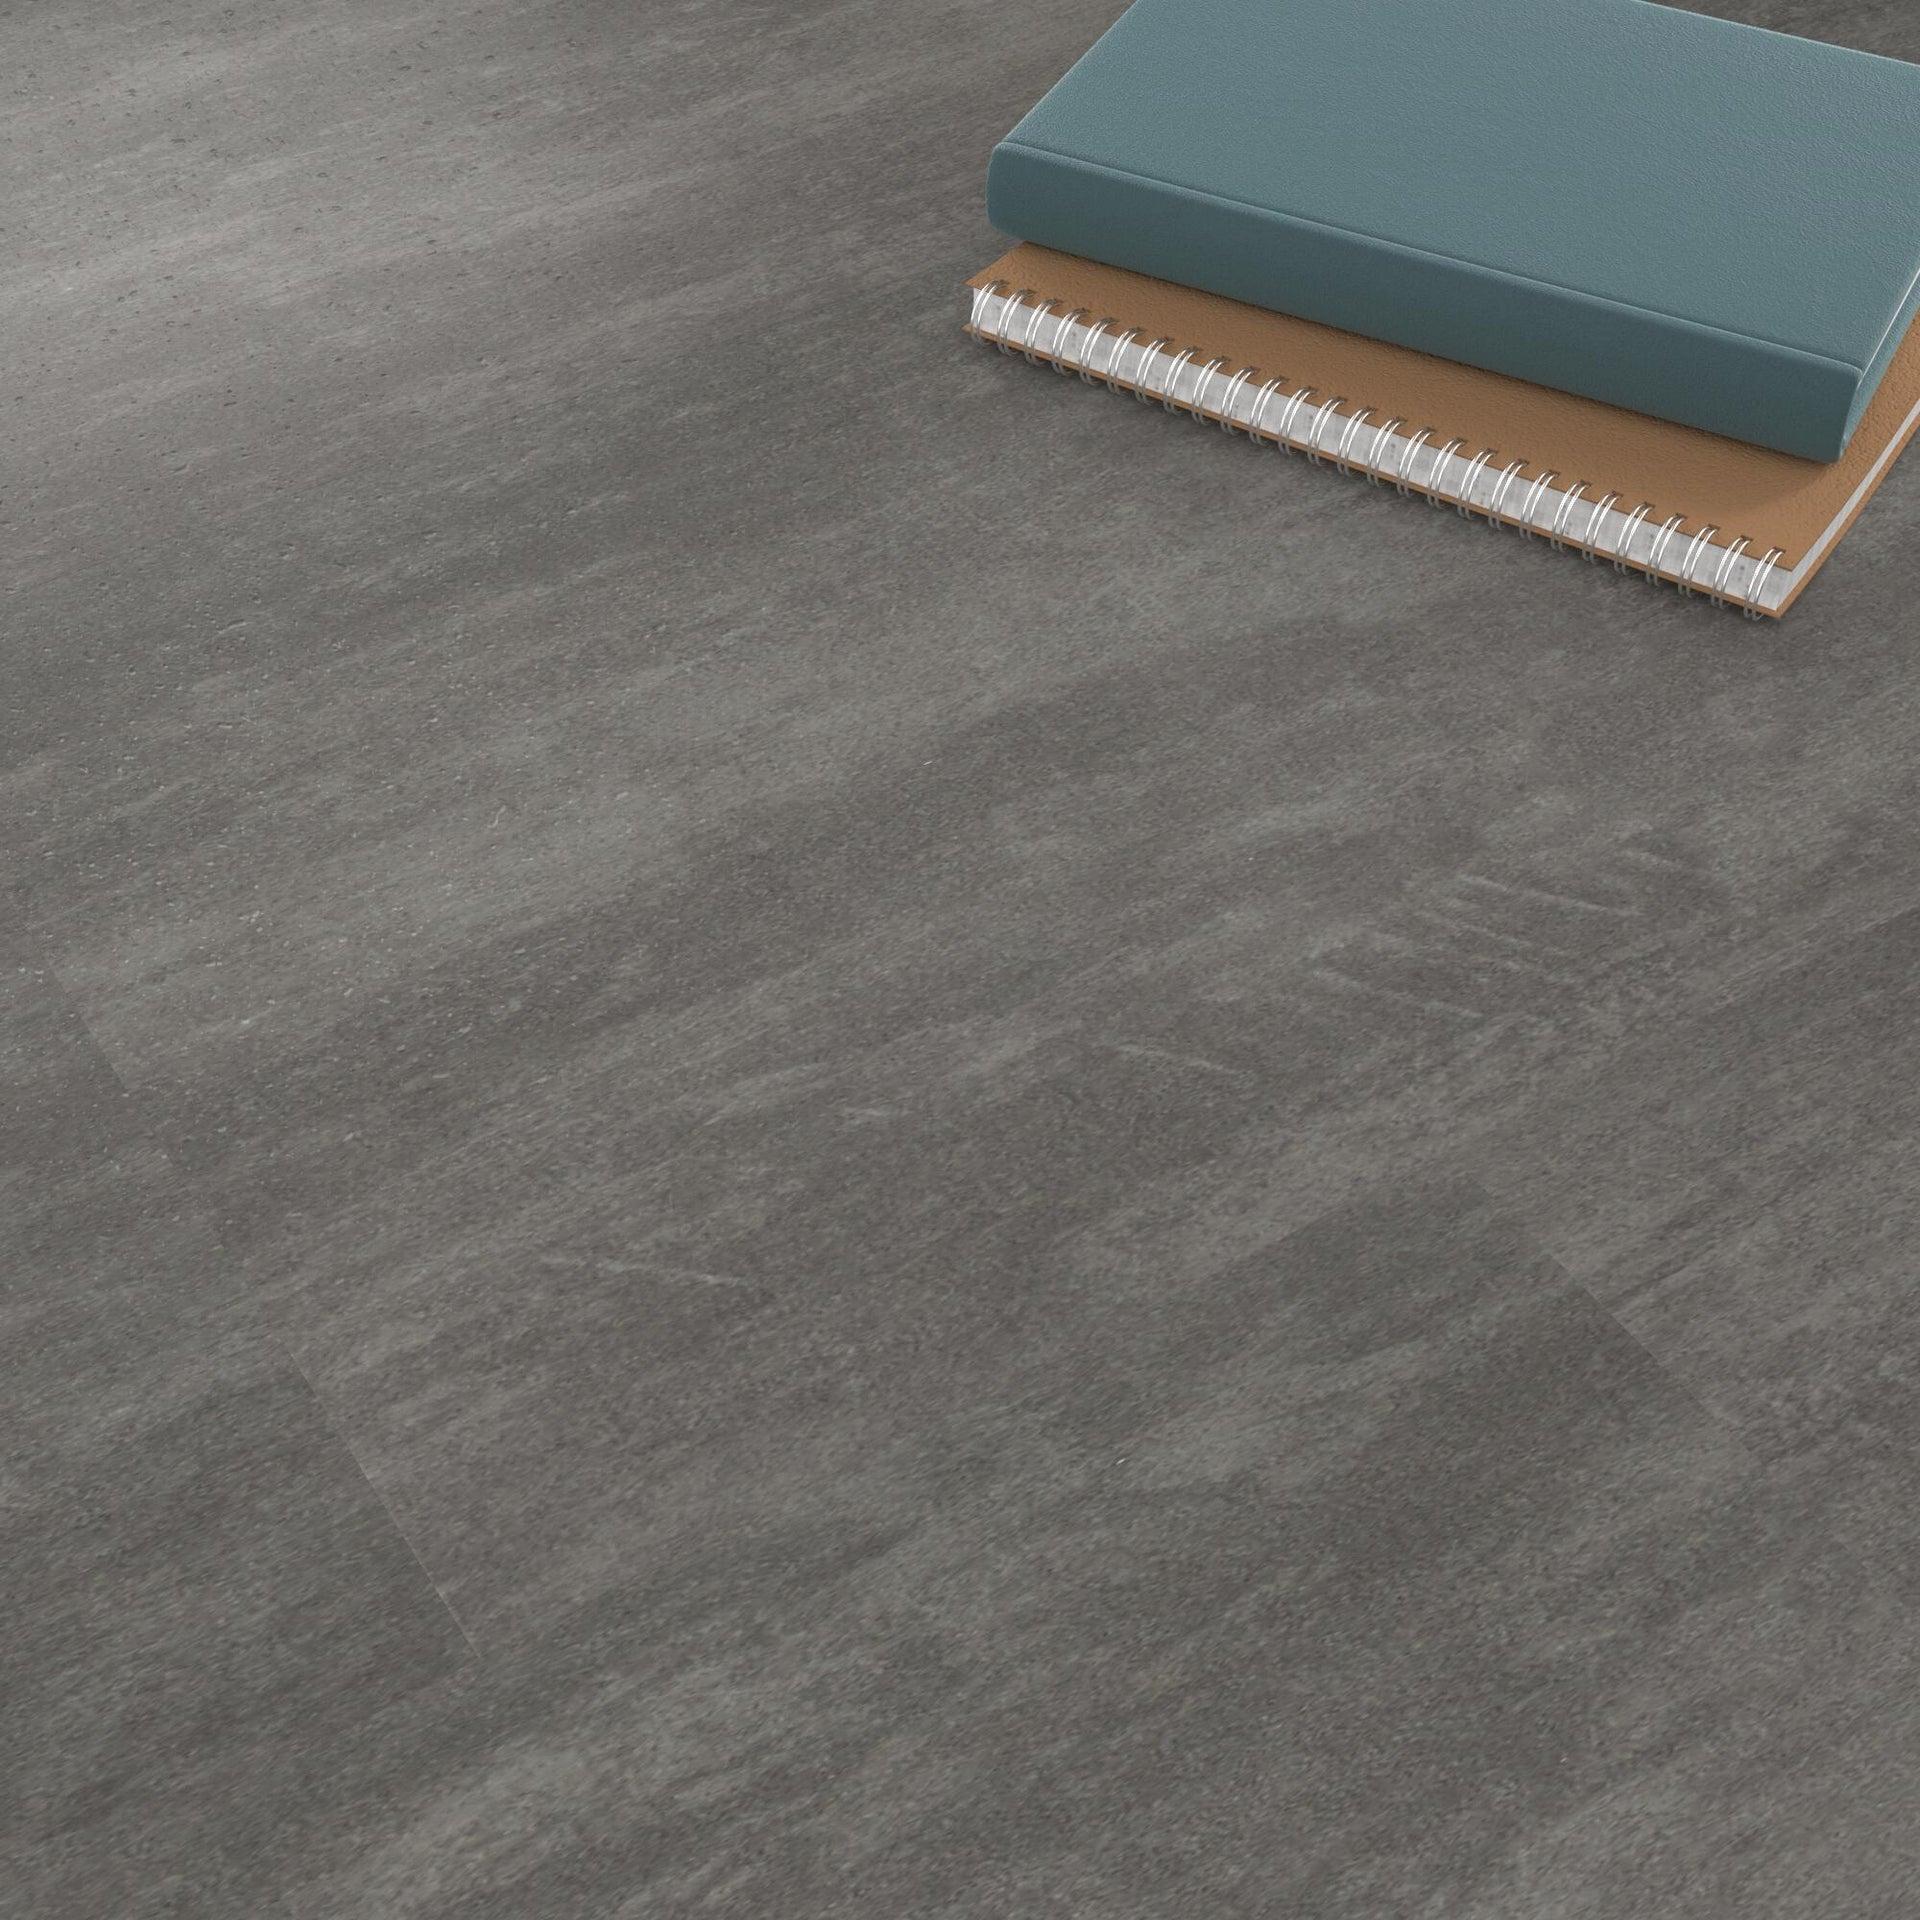 Pavimento PVC incastro Tolu Sp 4 mm grigio / argento - 8